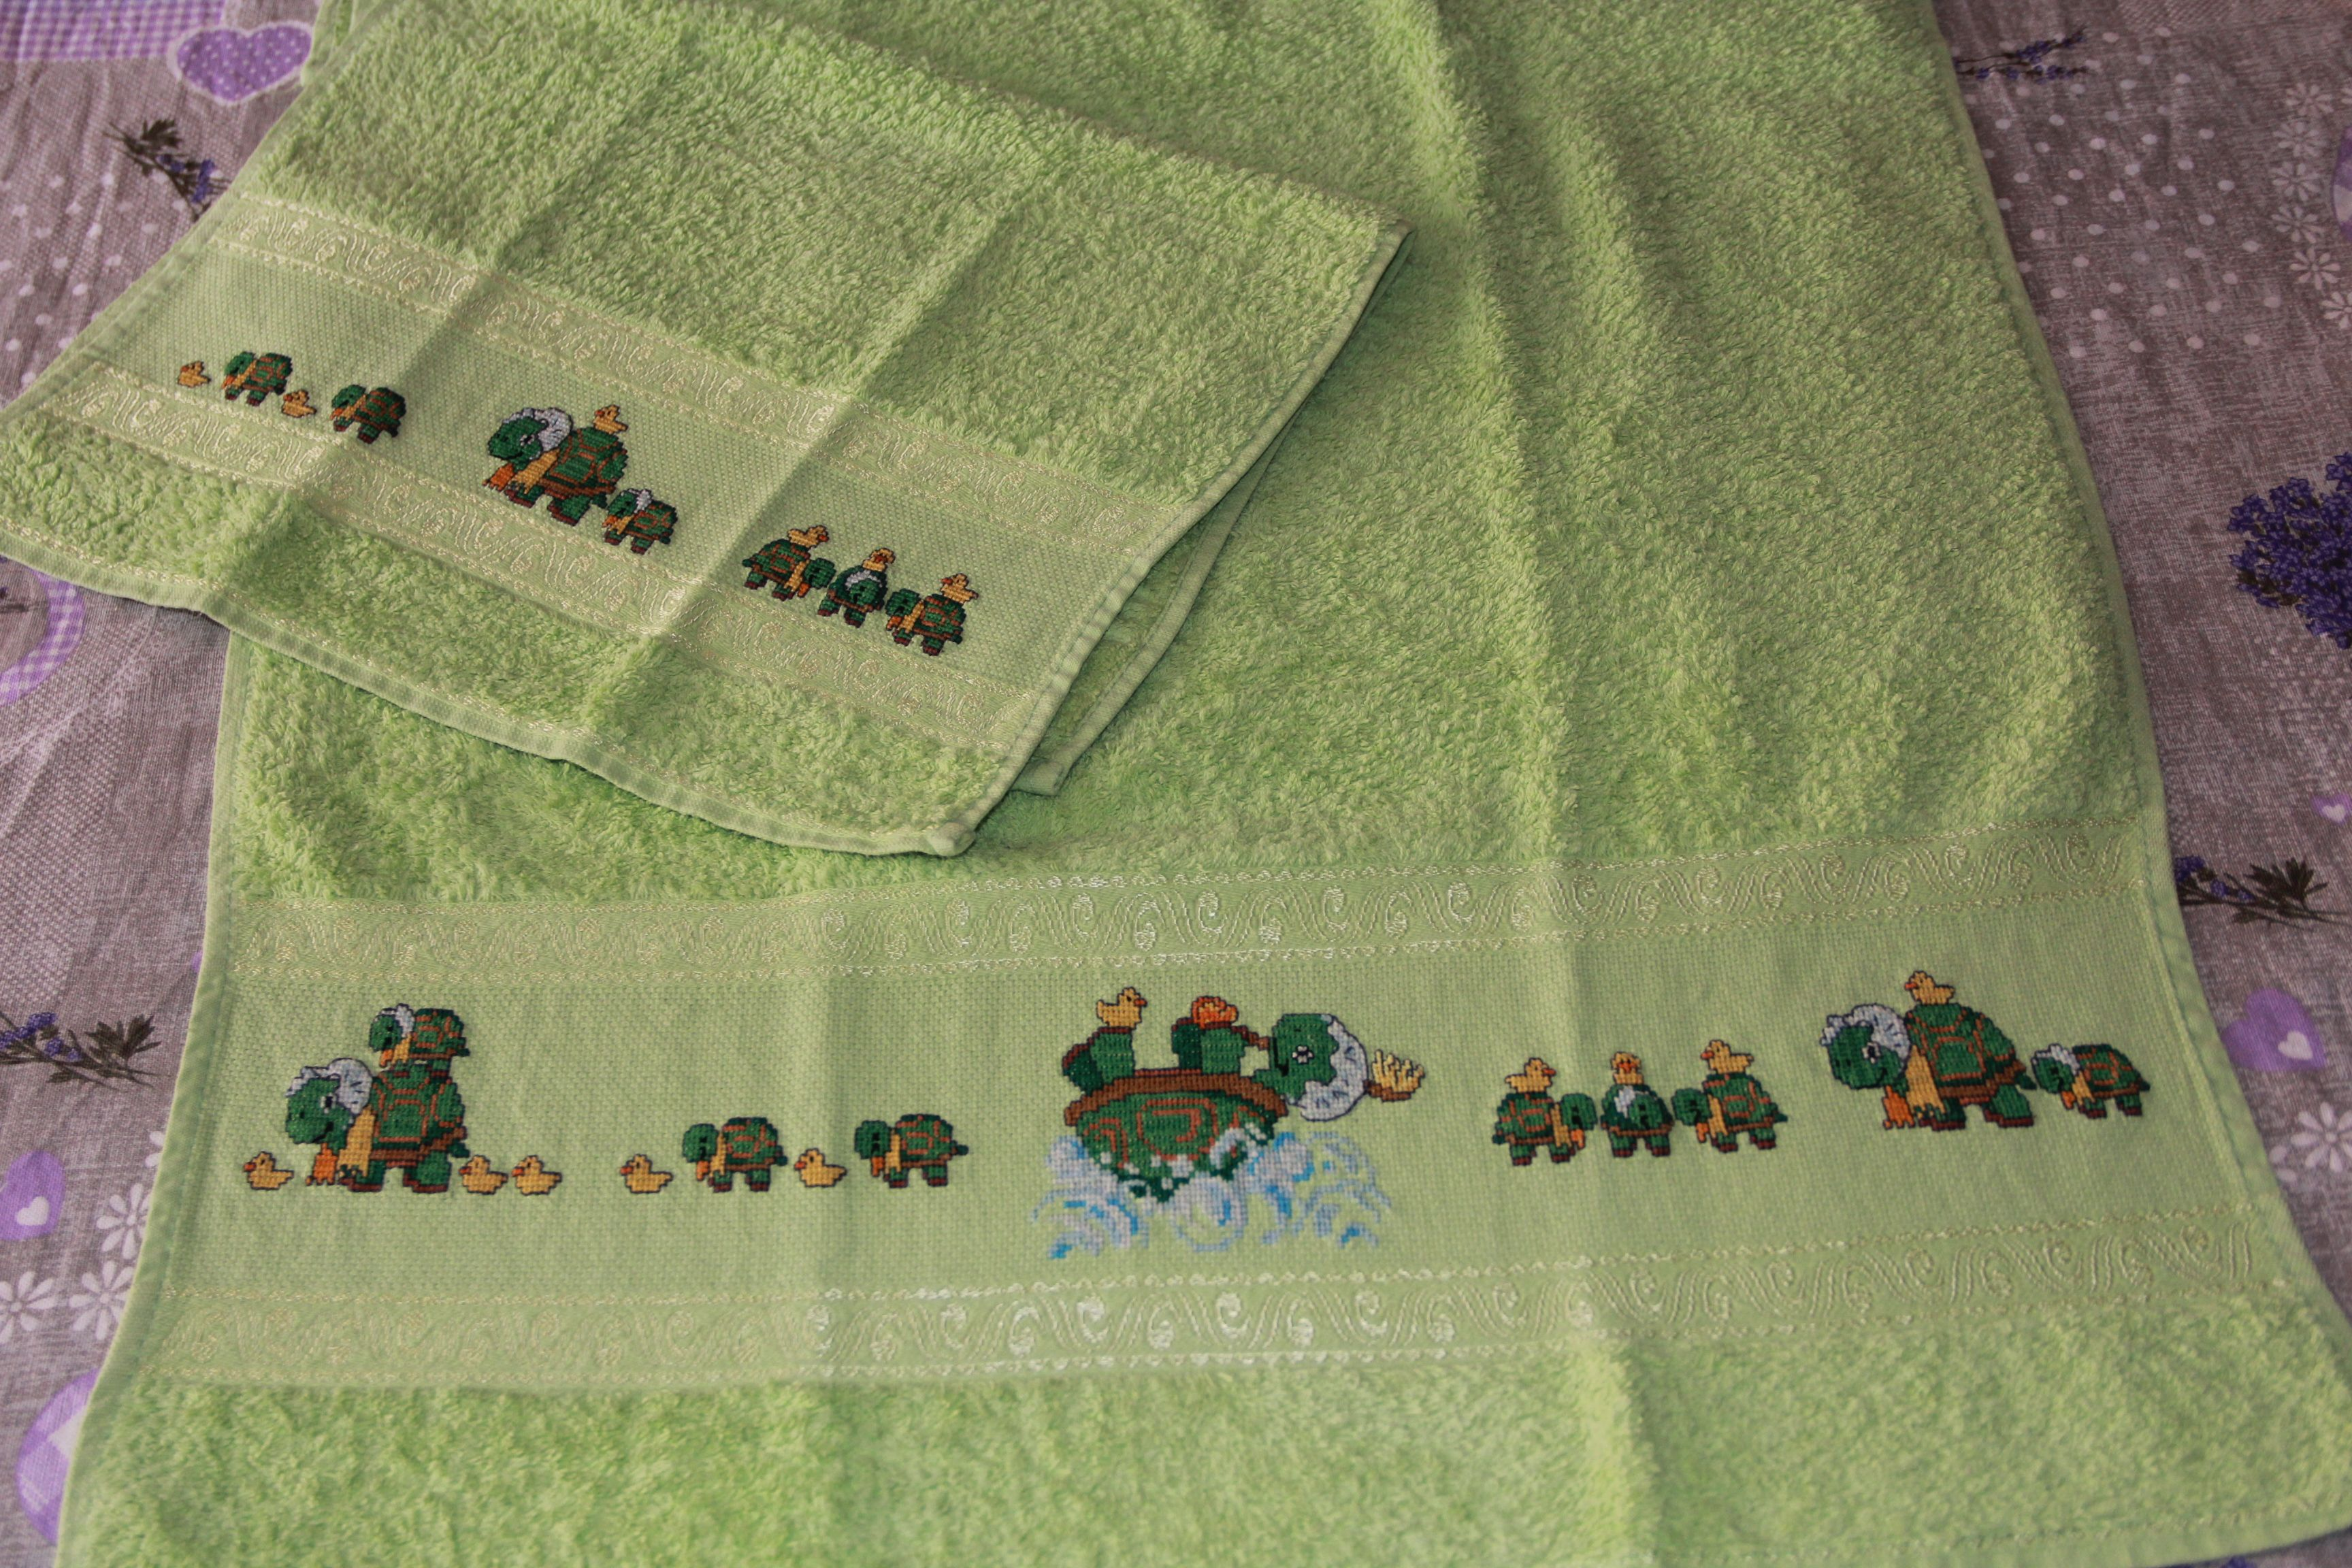 Set Asciugamani Con Tartarughe